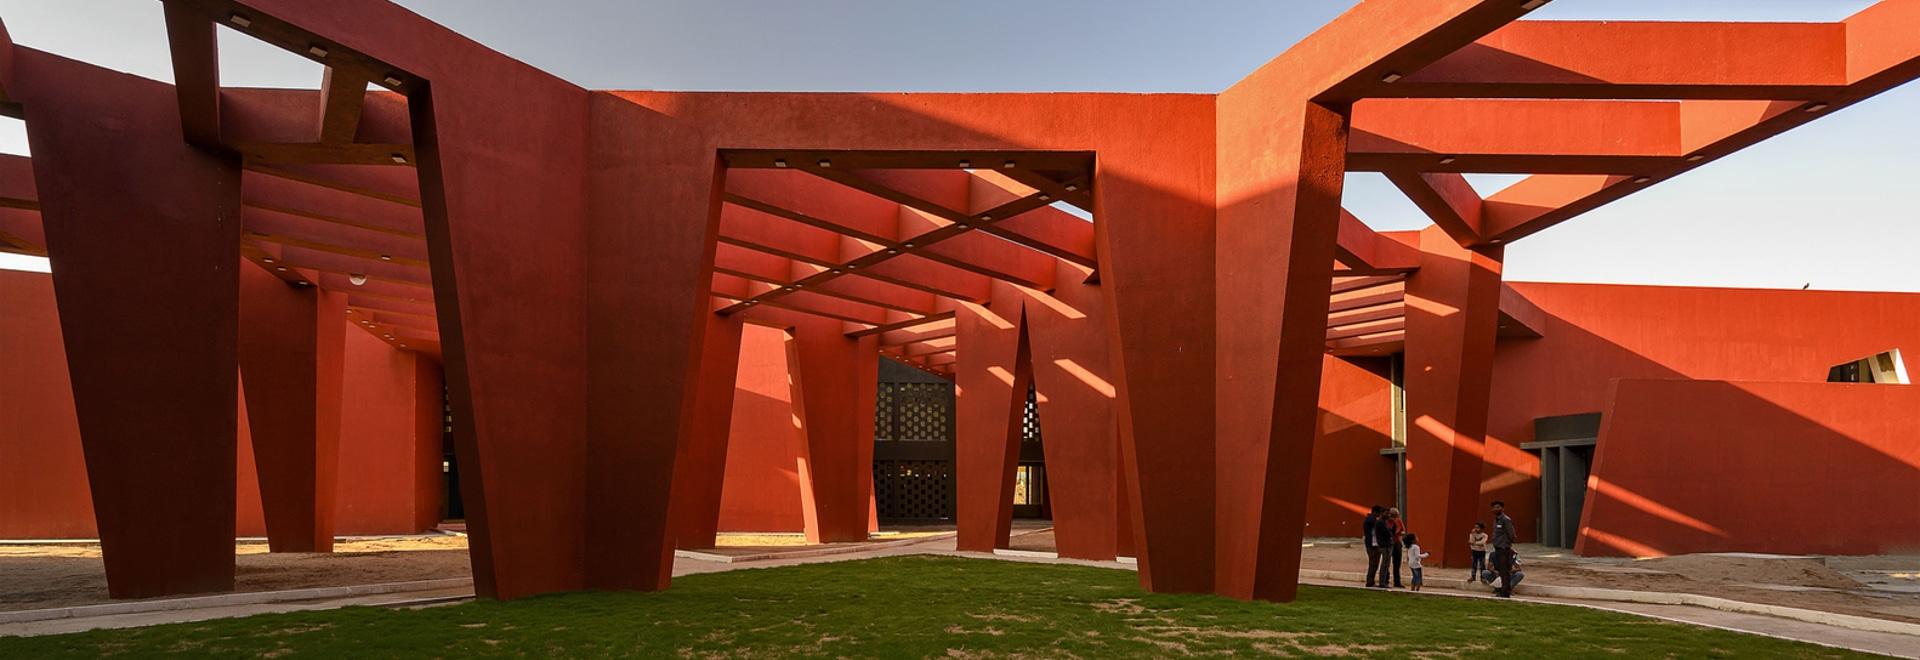 La Escuela de Rajasthan / Sanjay Puri Architects